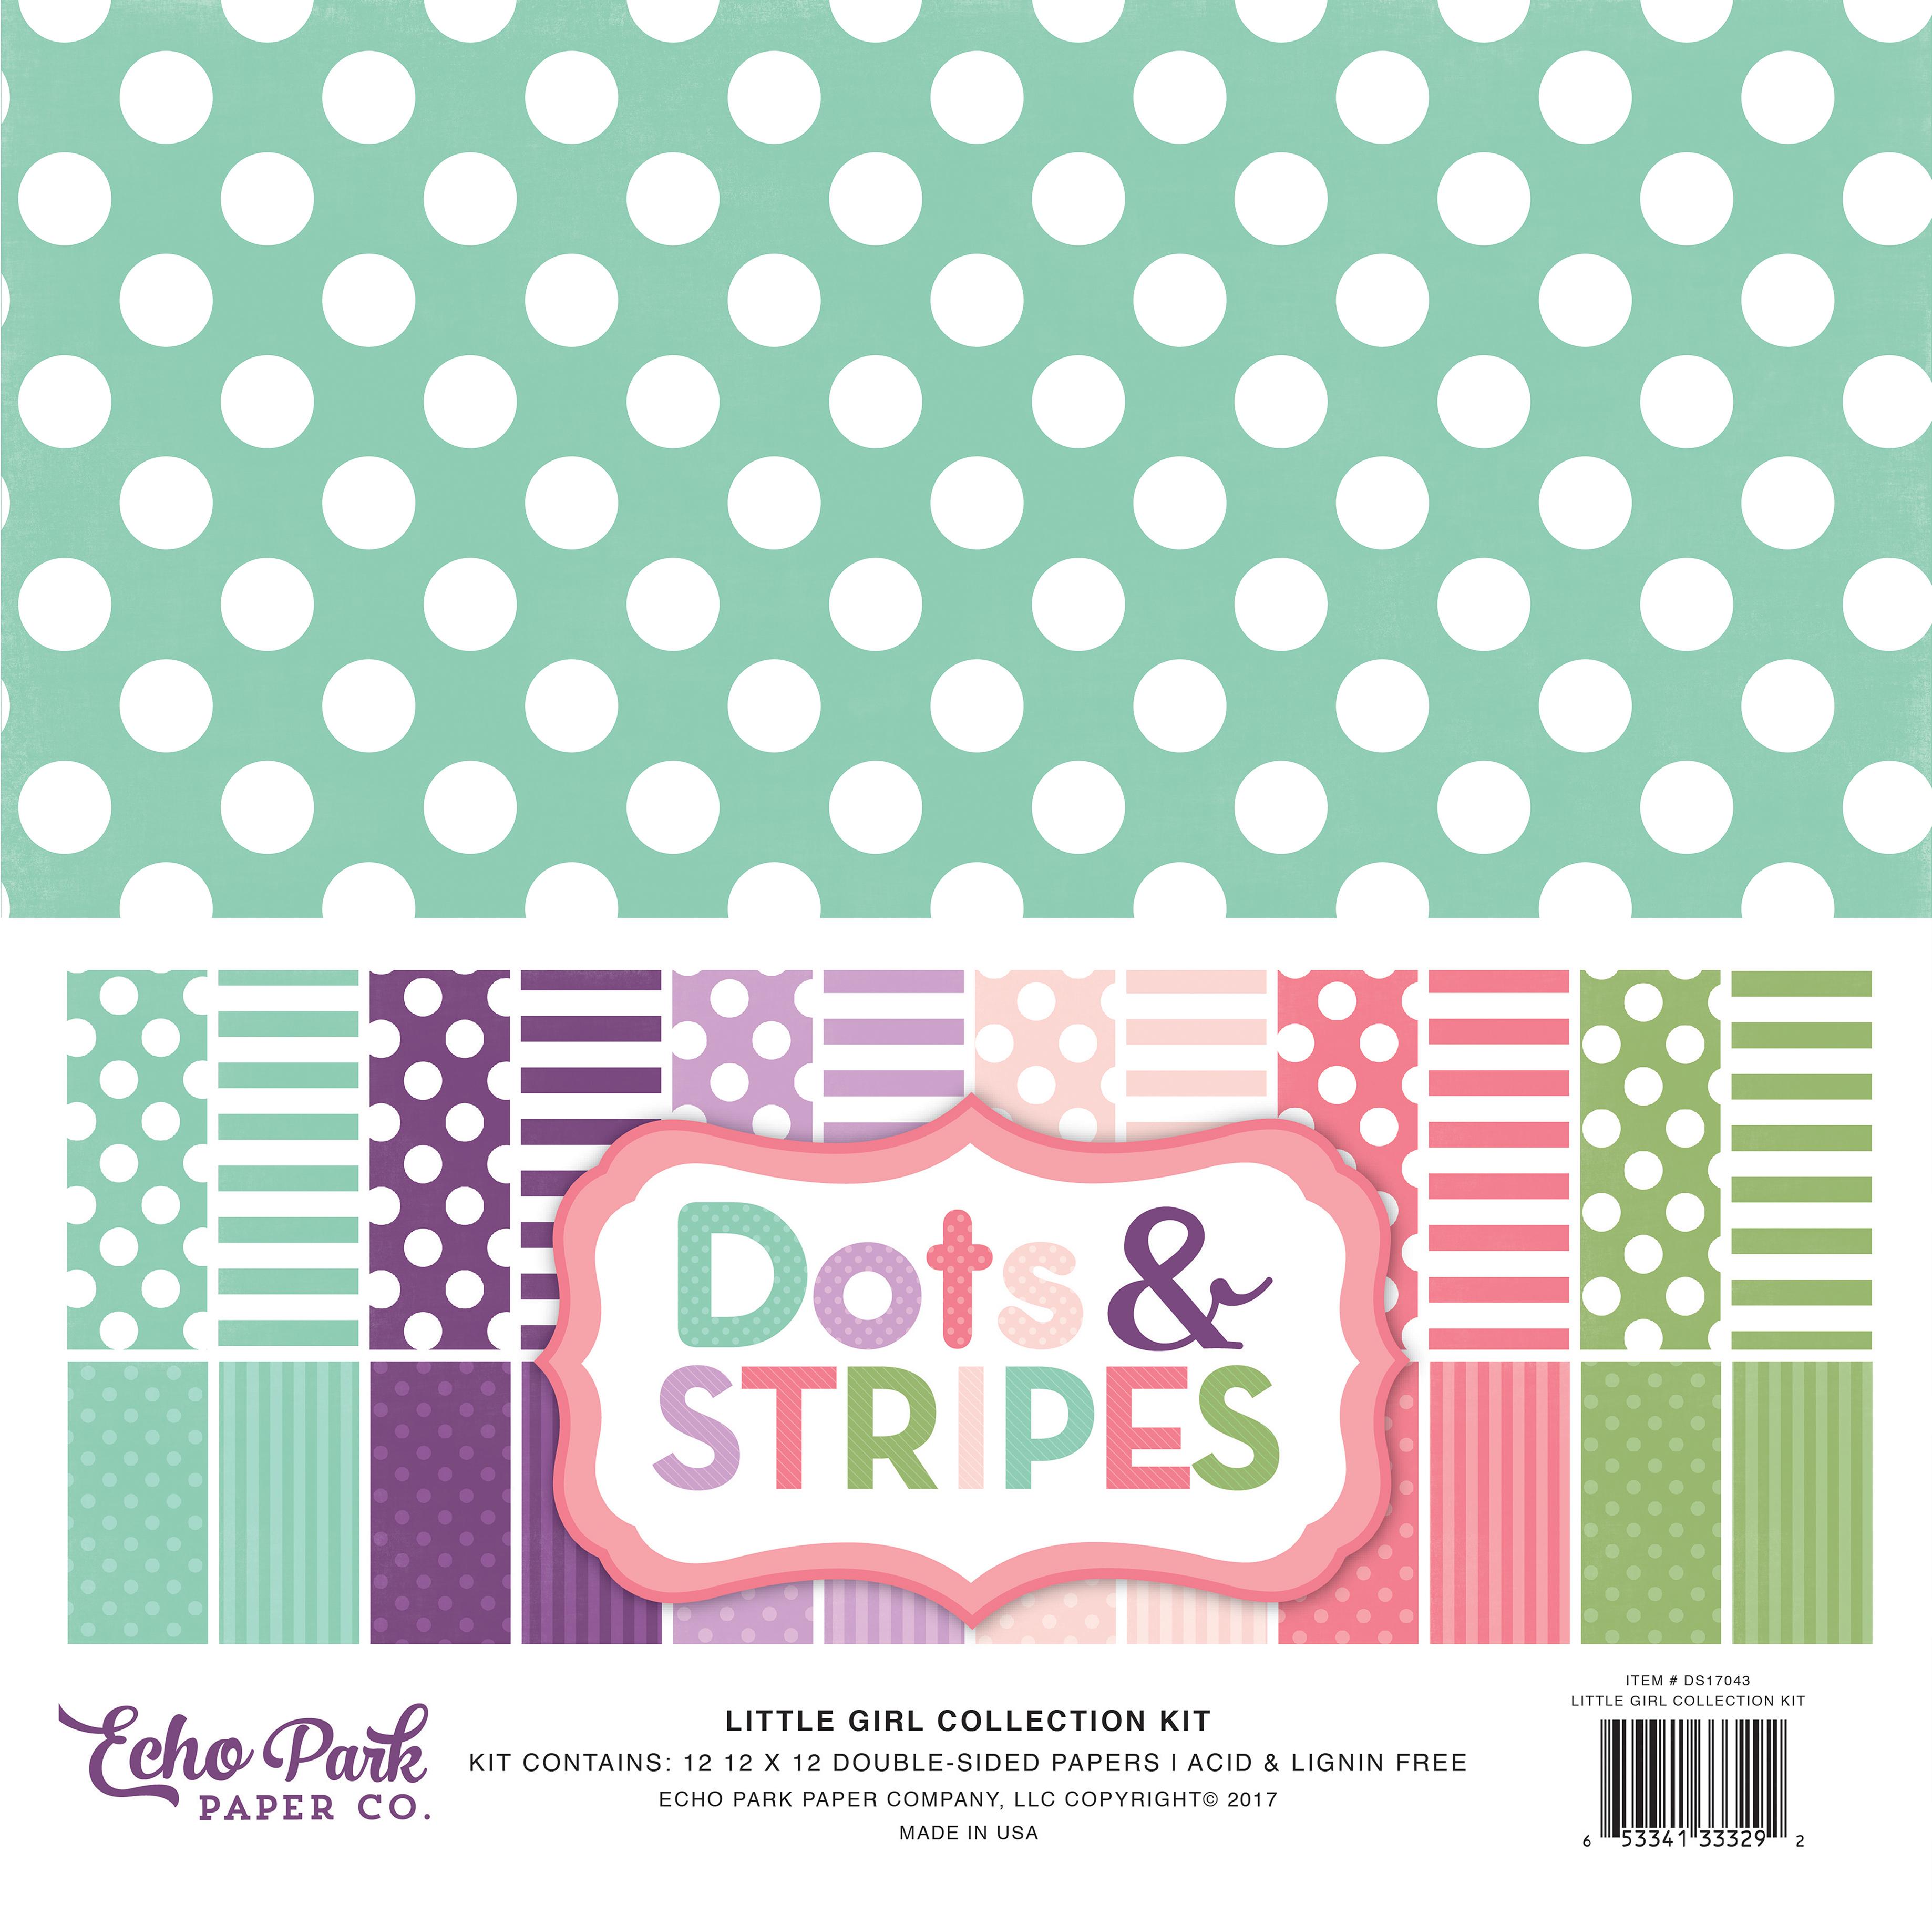 Dots & Stripes Little Girl